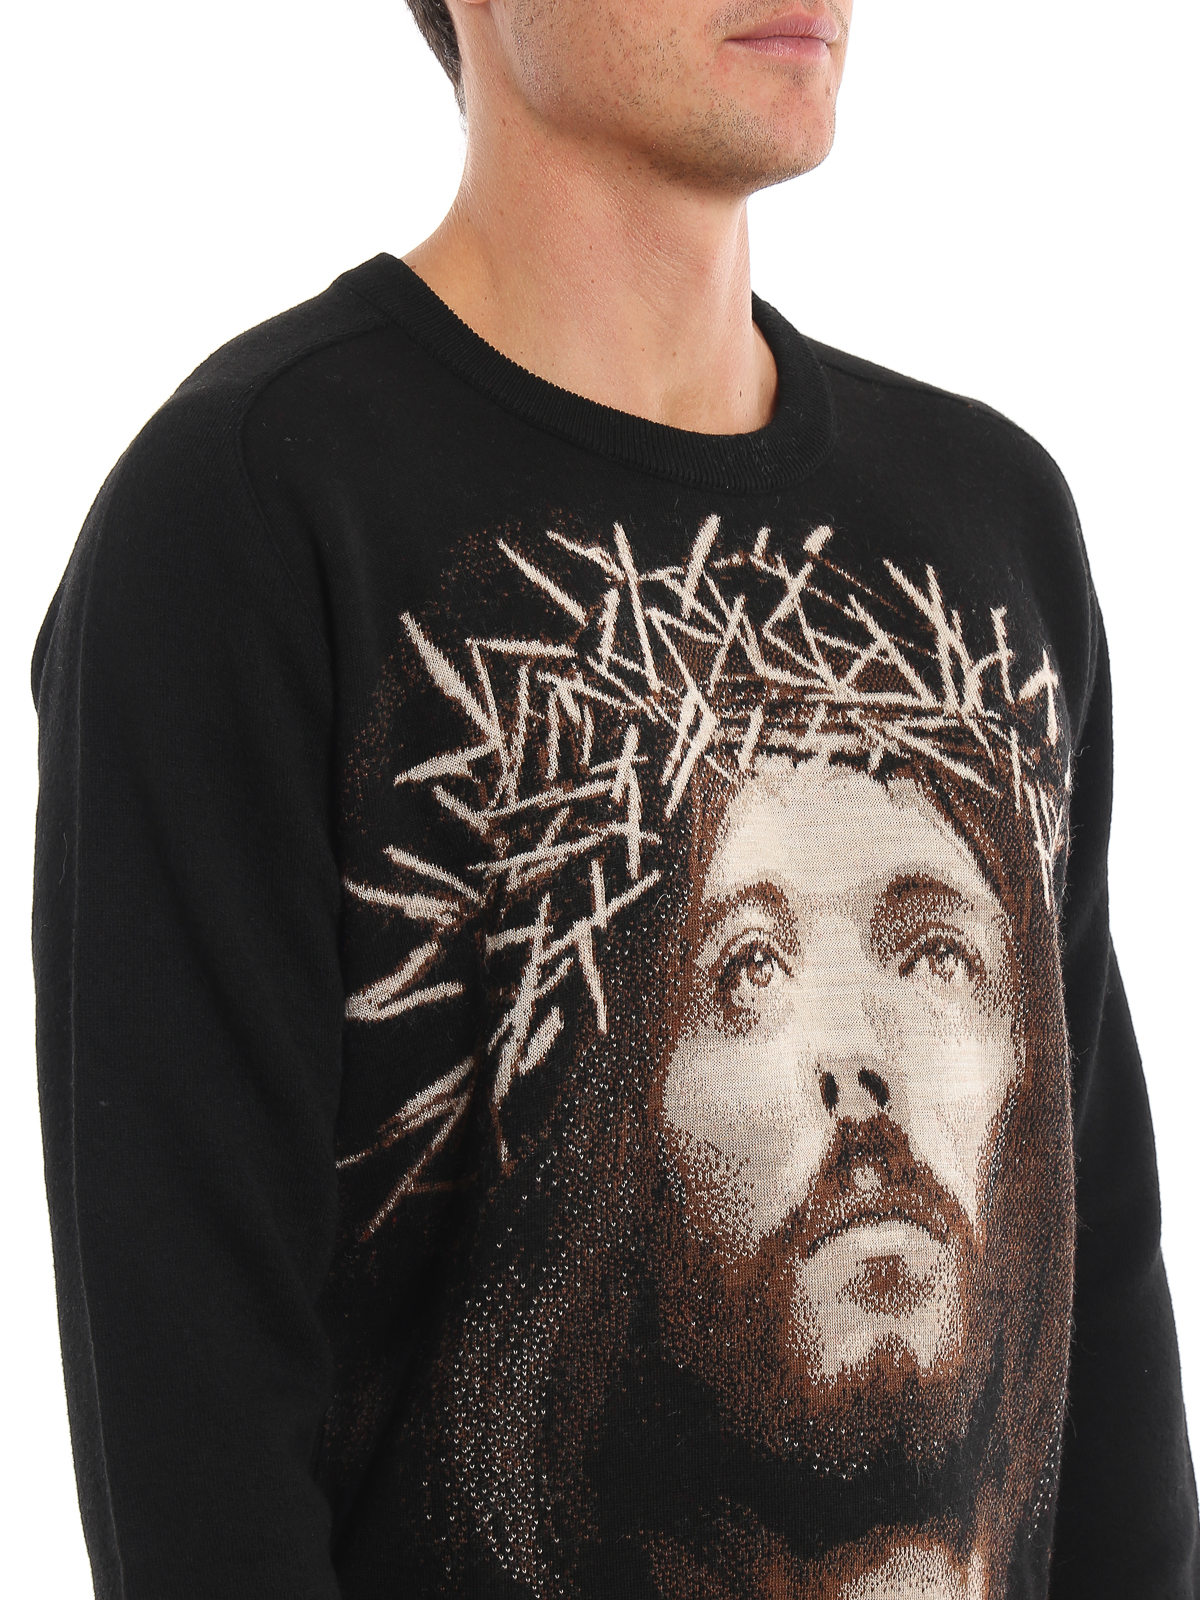 Picture of Ih Nom Uh Nit | Jesus Jacquard